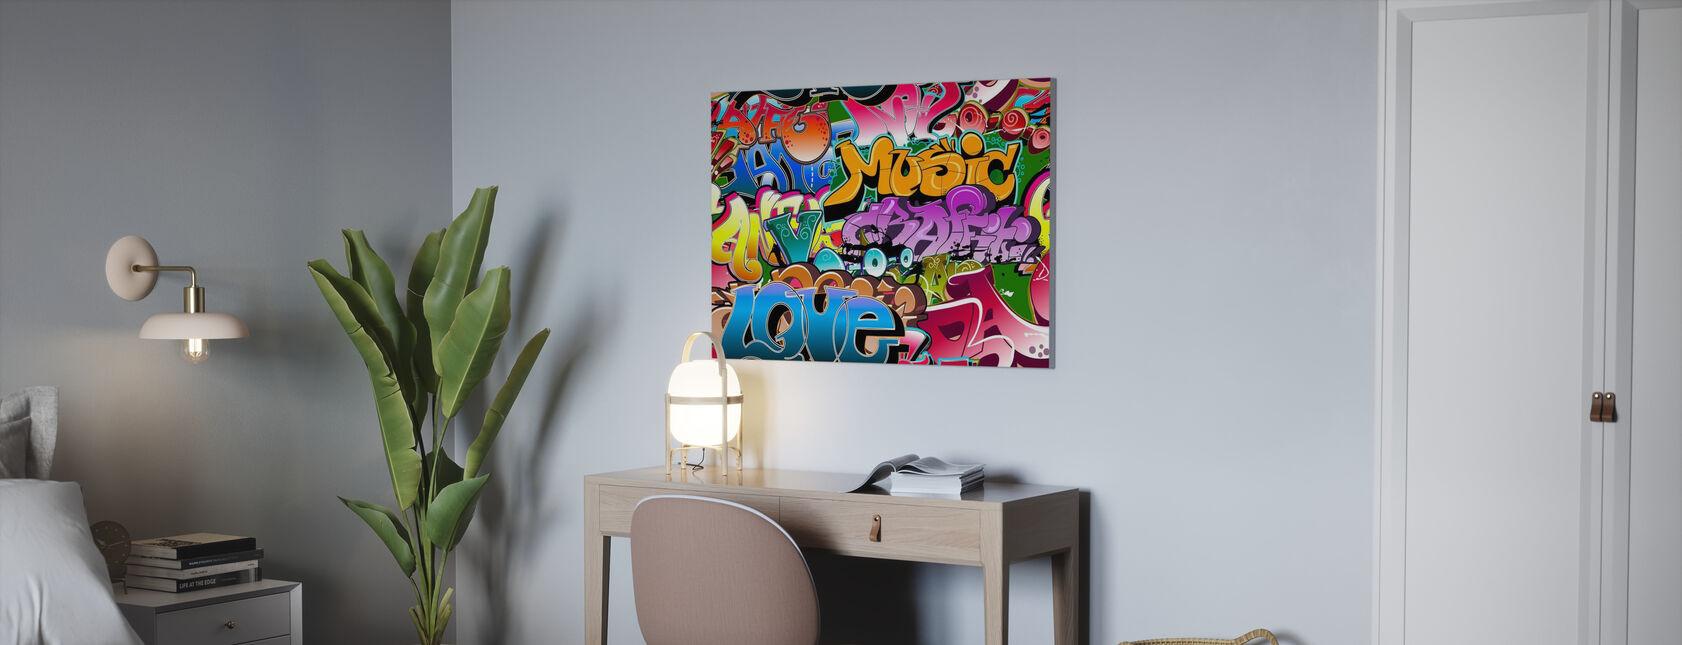 Musik Kärlek Graffiti - Canvastavla - Kontor